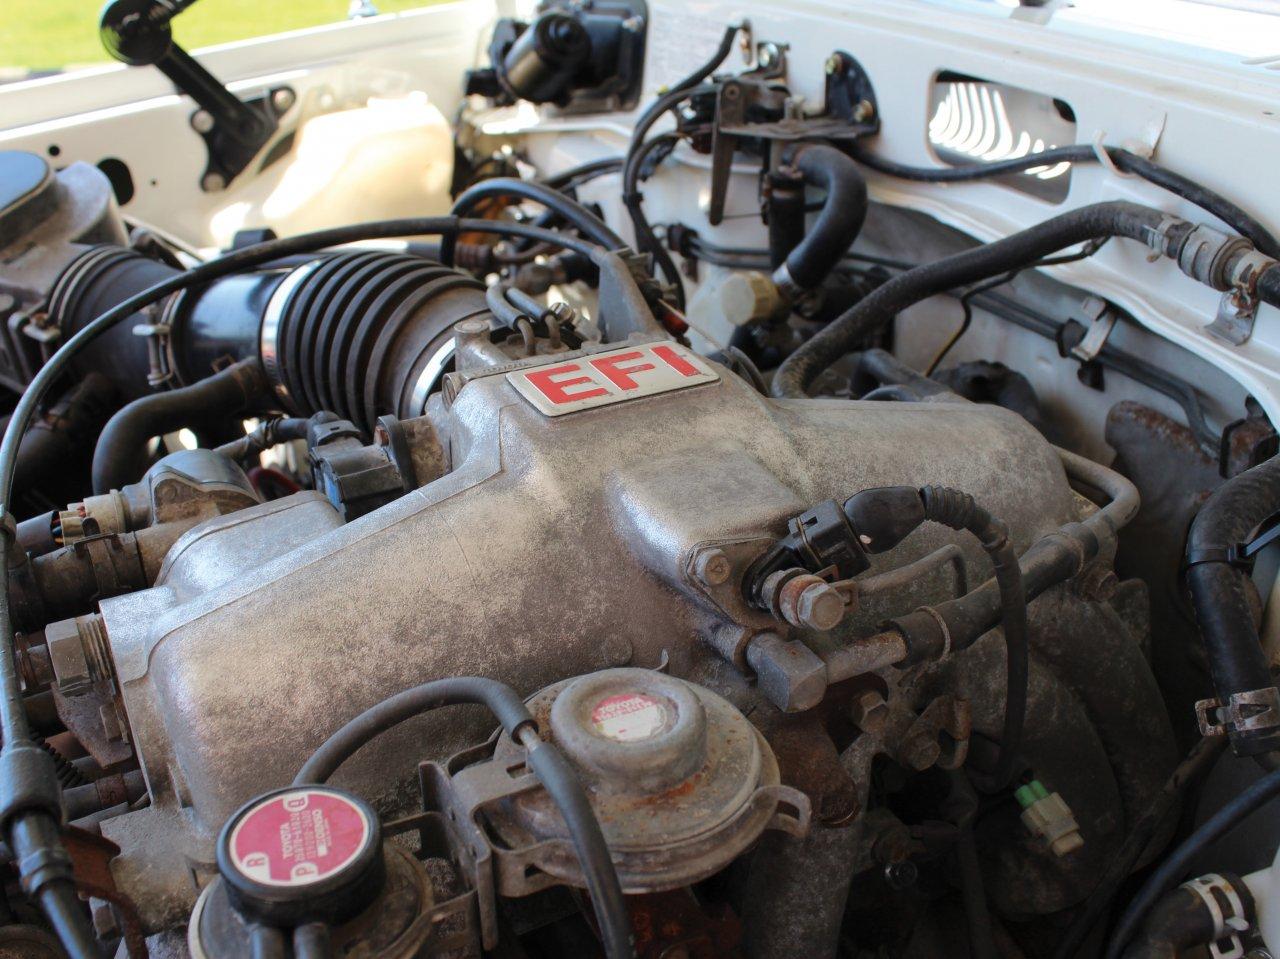 For Sale - Toyota Land Cruiser FJ62 For Sale - Detroit Michigan ...